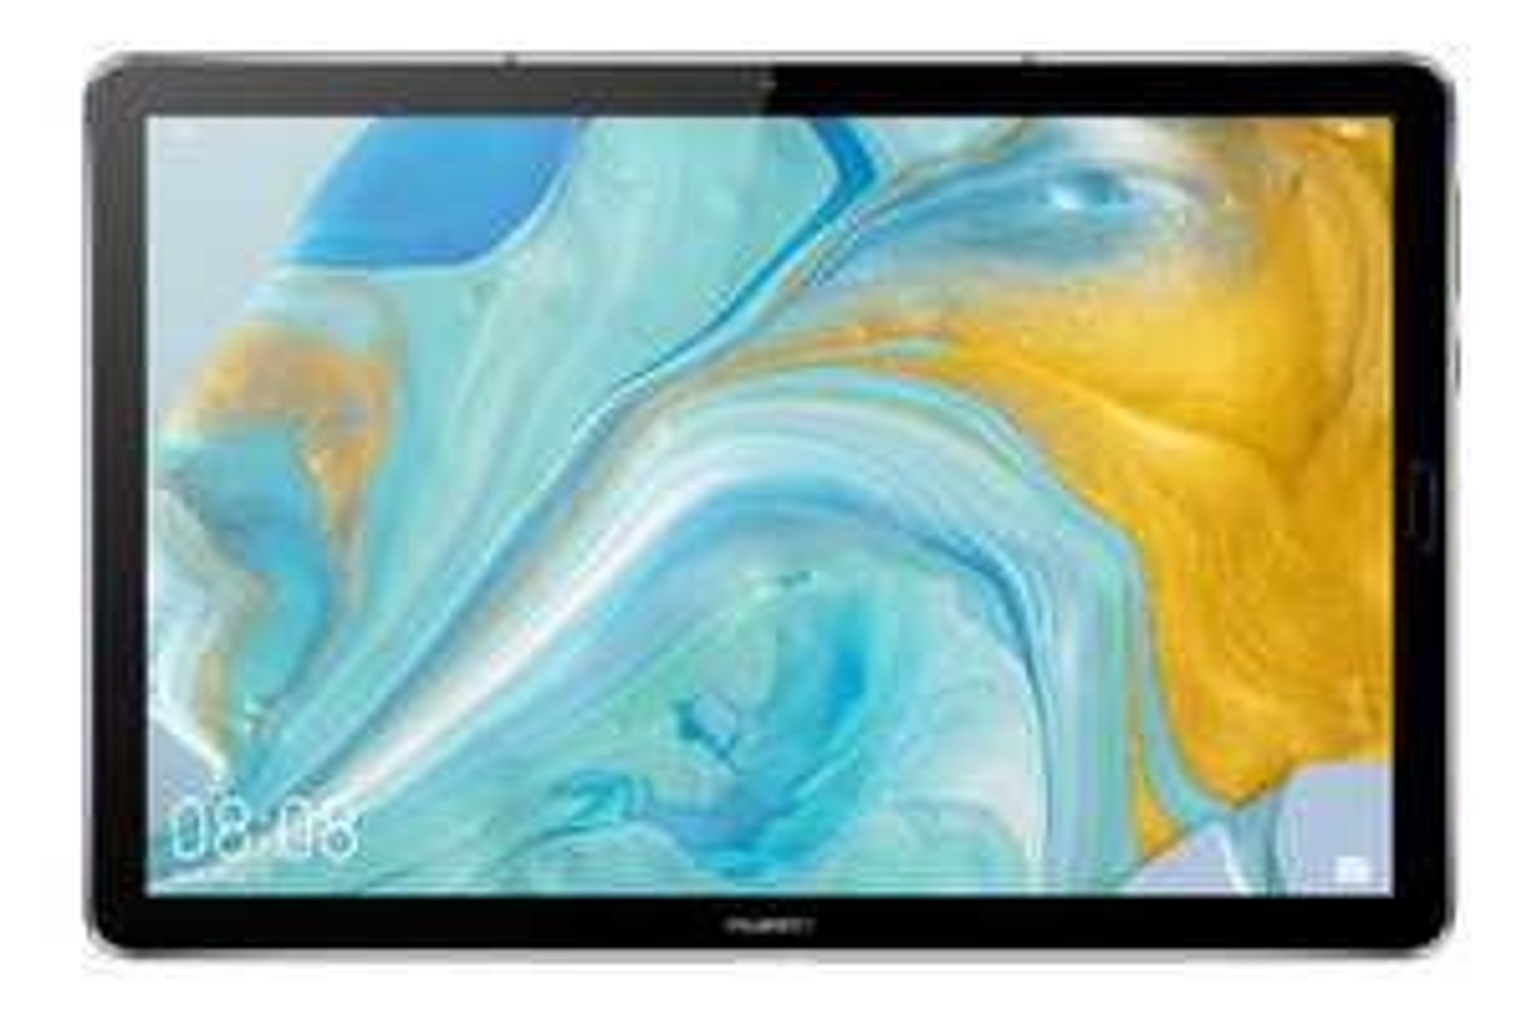 Huawei MediaPad M6 10.8in 64GB Wi-Fi Tablet - Grey £249.99 (Click & Collect) @ Argos